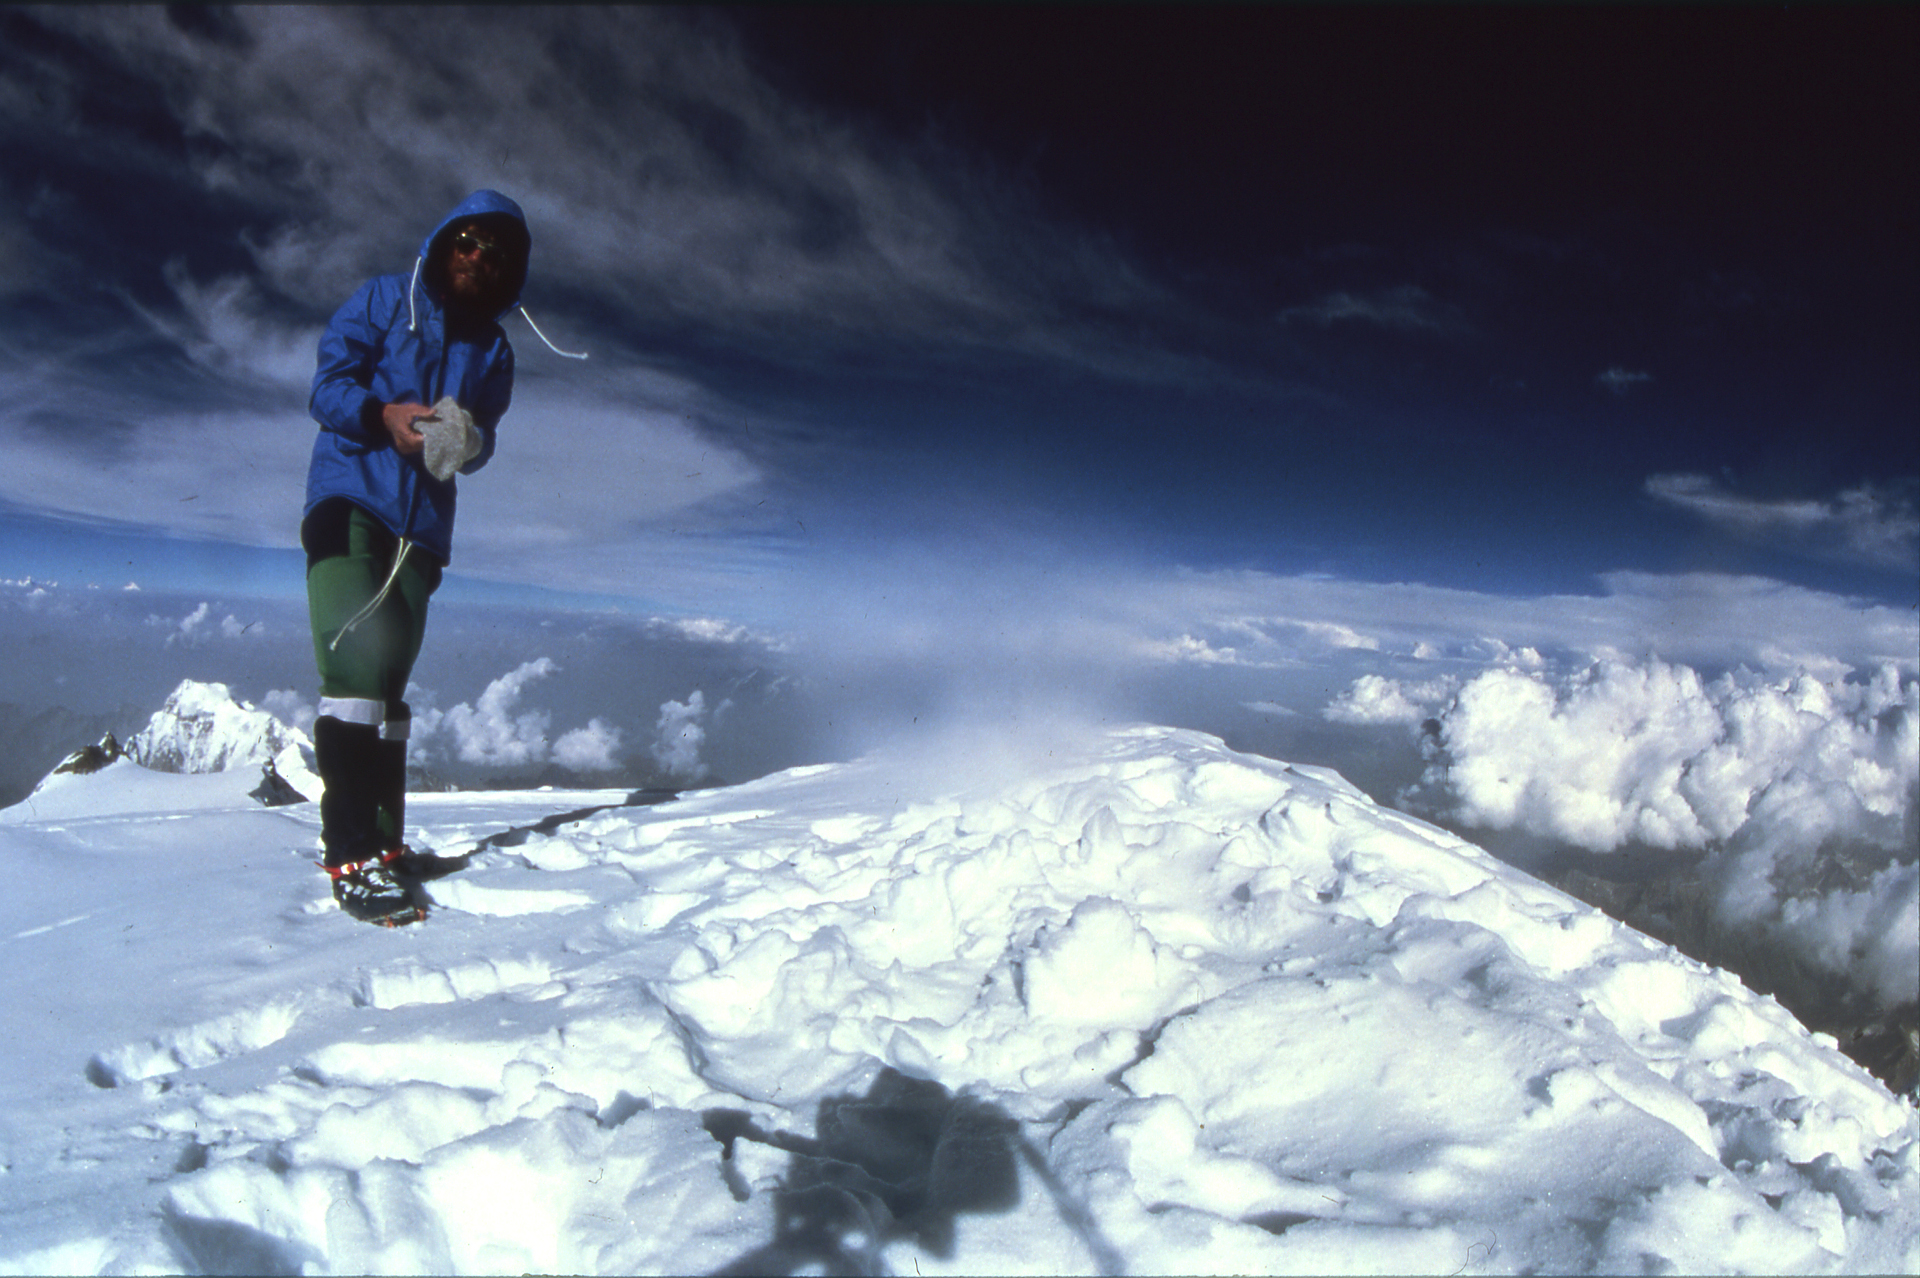 Reinhold Messner 1978 auf dem Gipfel des Nanga Parbat